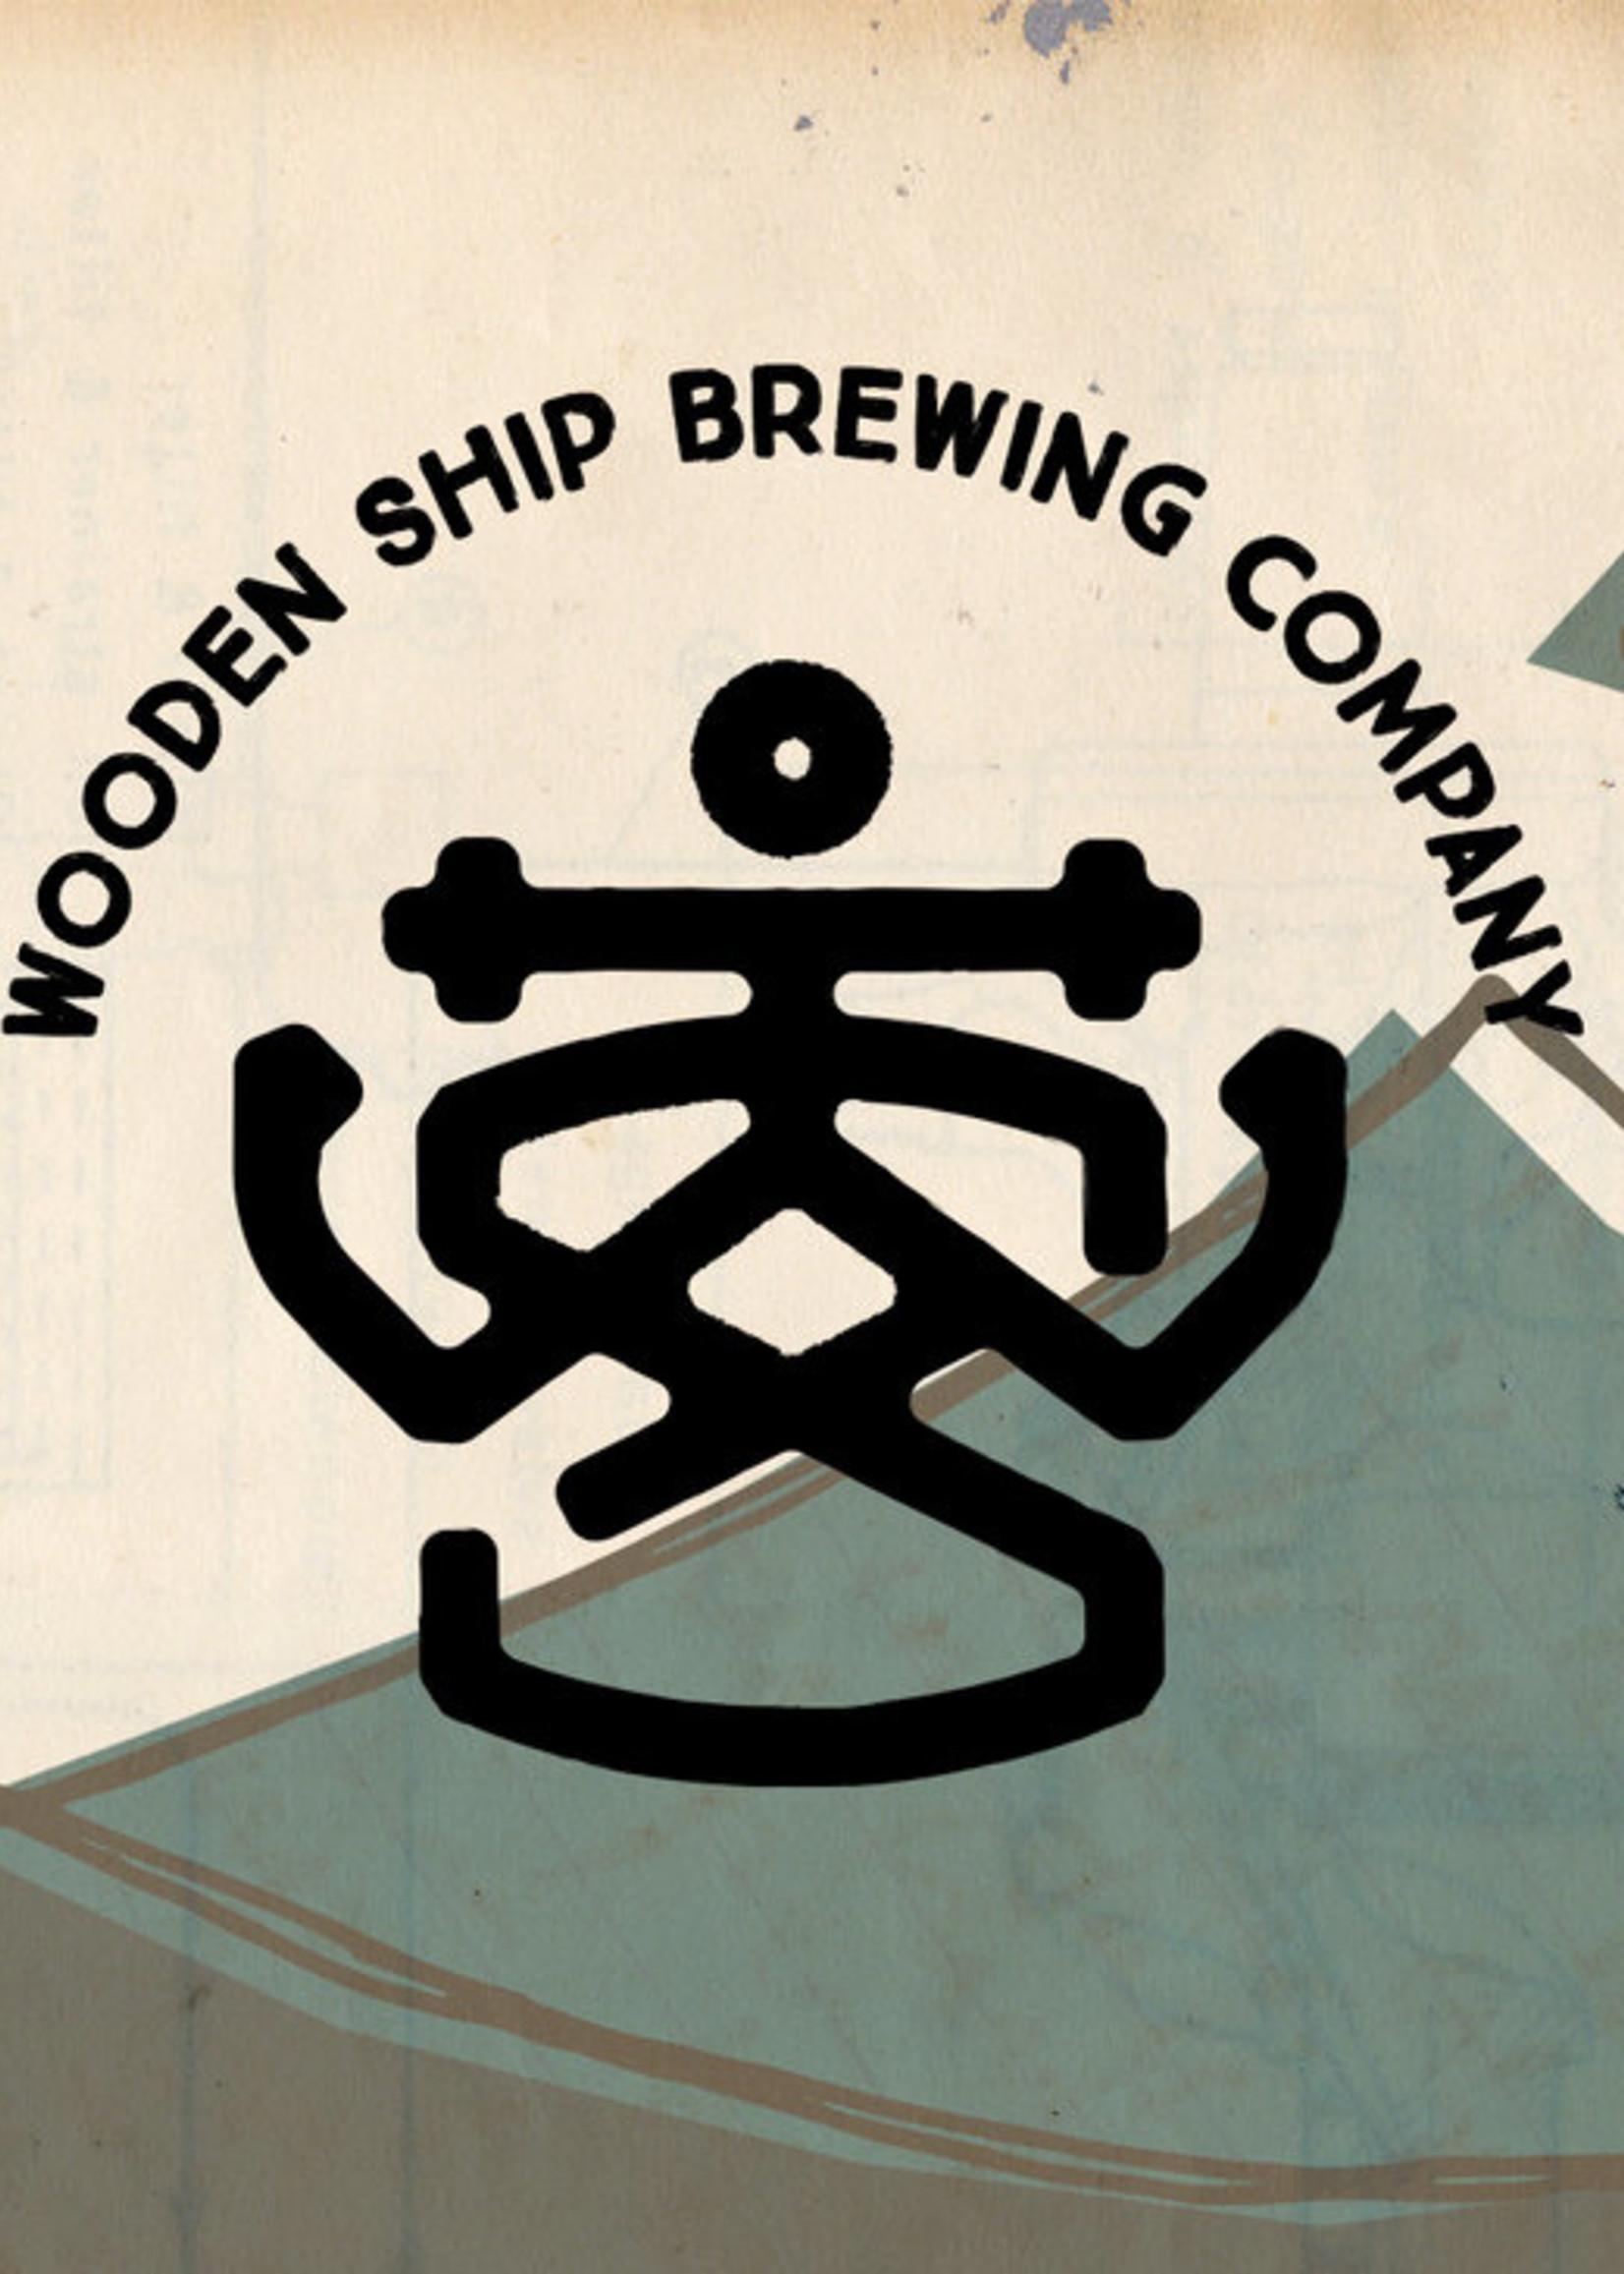 Wooden Ship Smoked Porter - Crowler